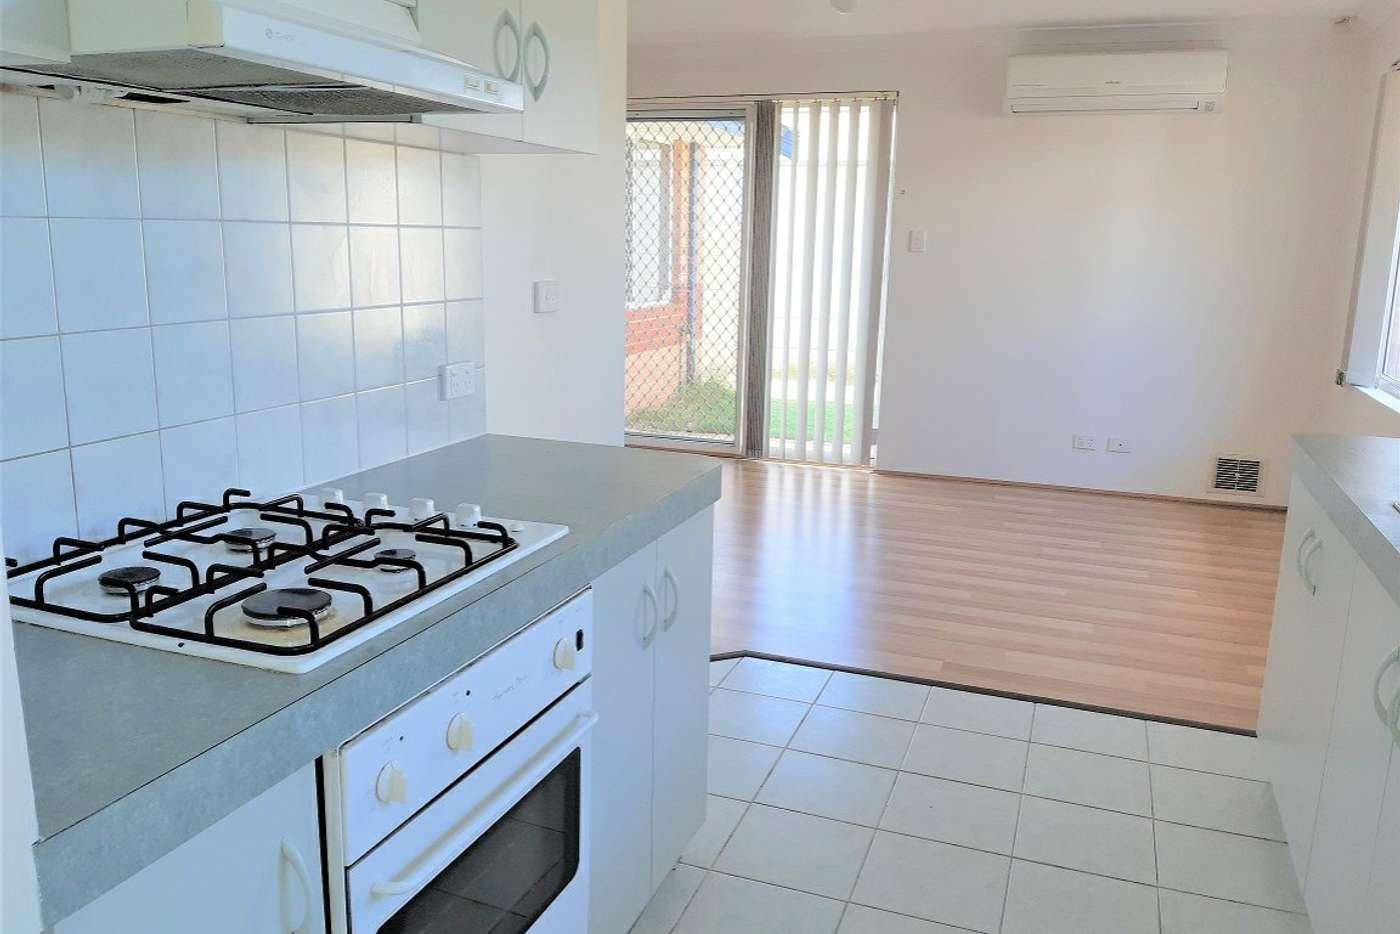 Sixth view of Homely villa listing, 5/38 Woodloes Street, Cannington WA 6107